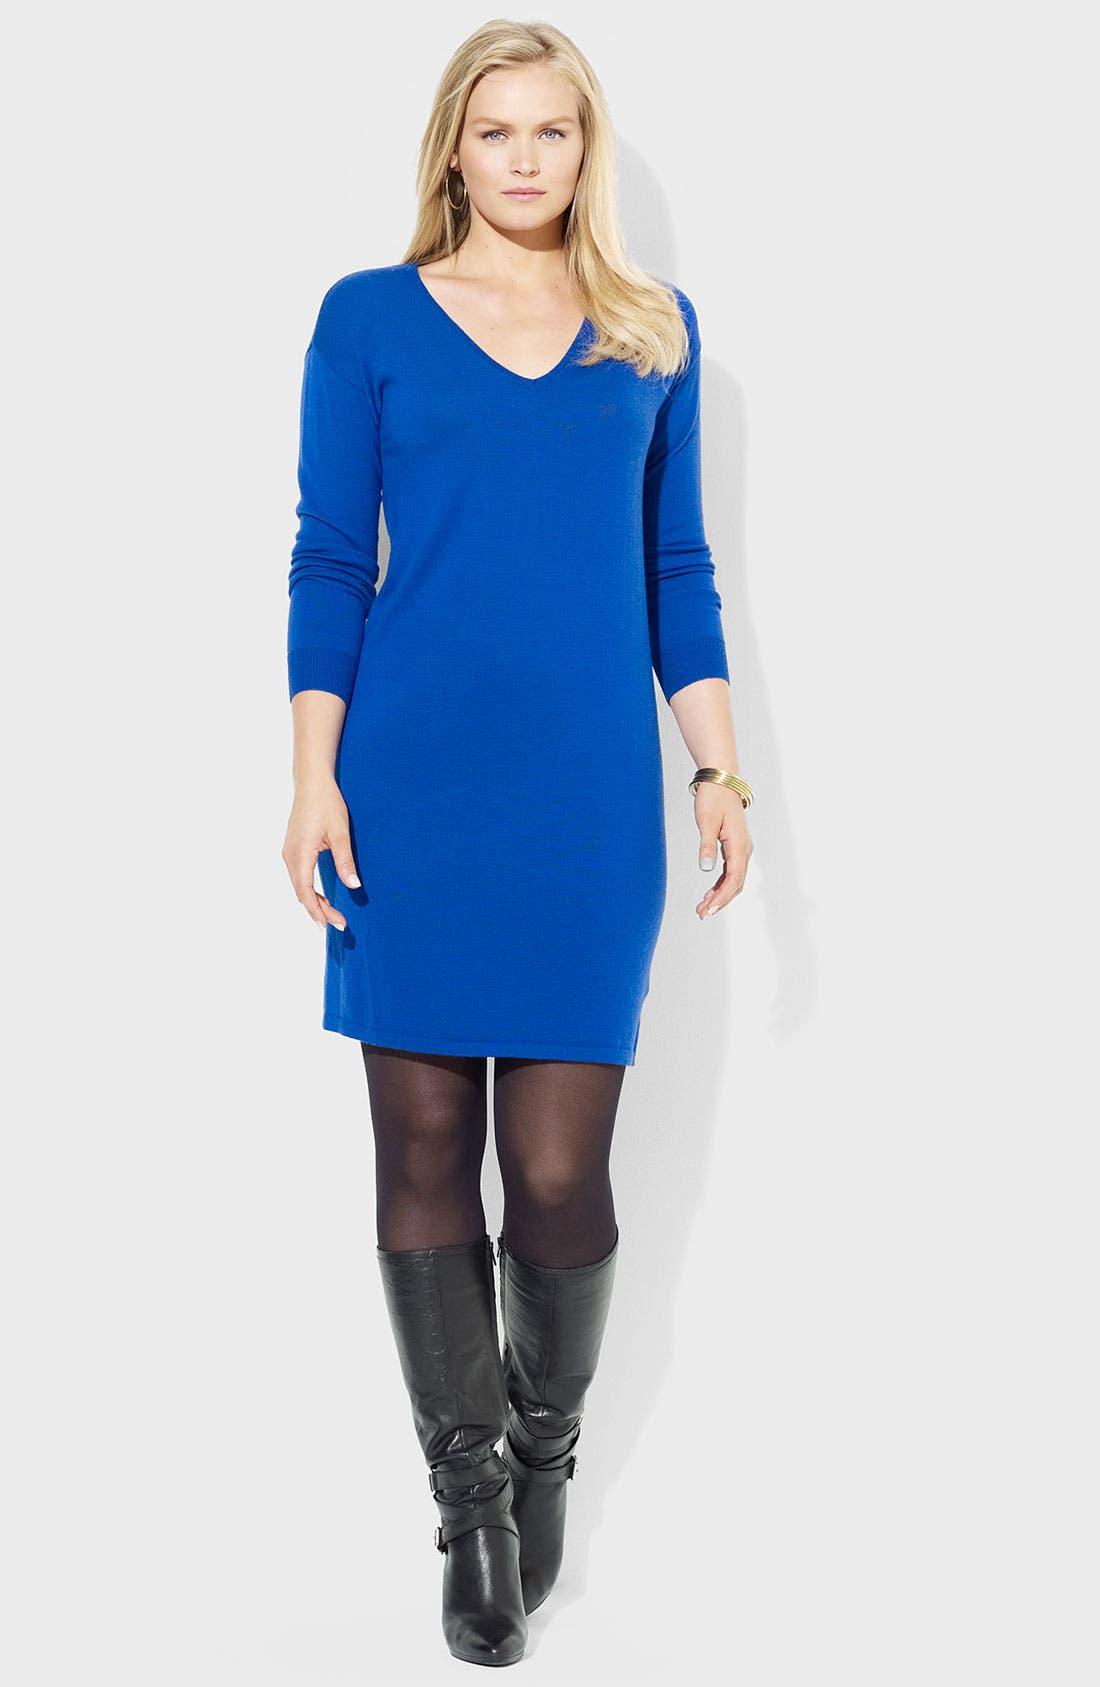 Alternate Image 1 Selected - Lauren Ralph Lauren V-Neck Merino Wool Sweater Dress (Plus)